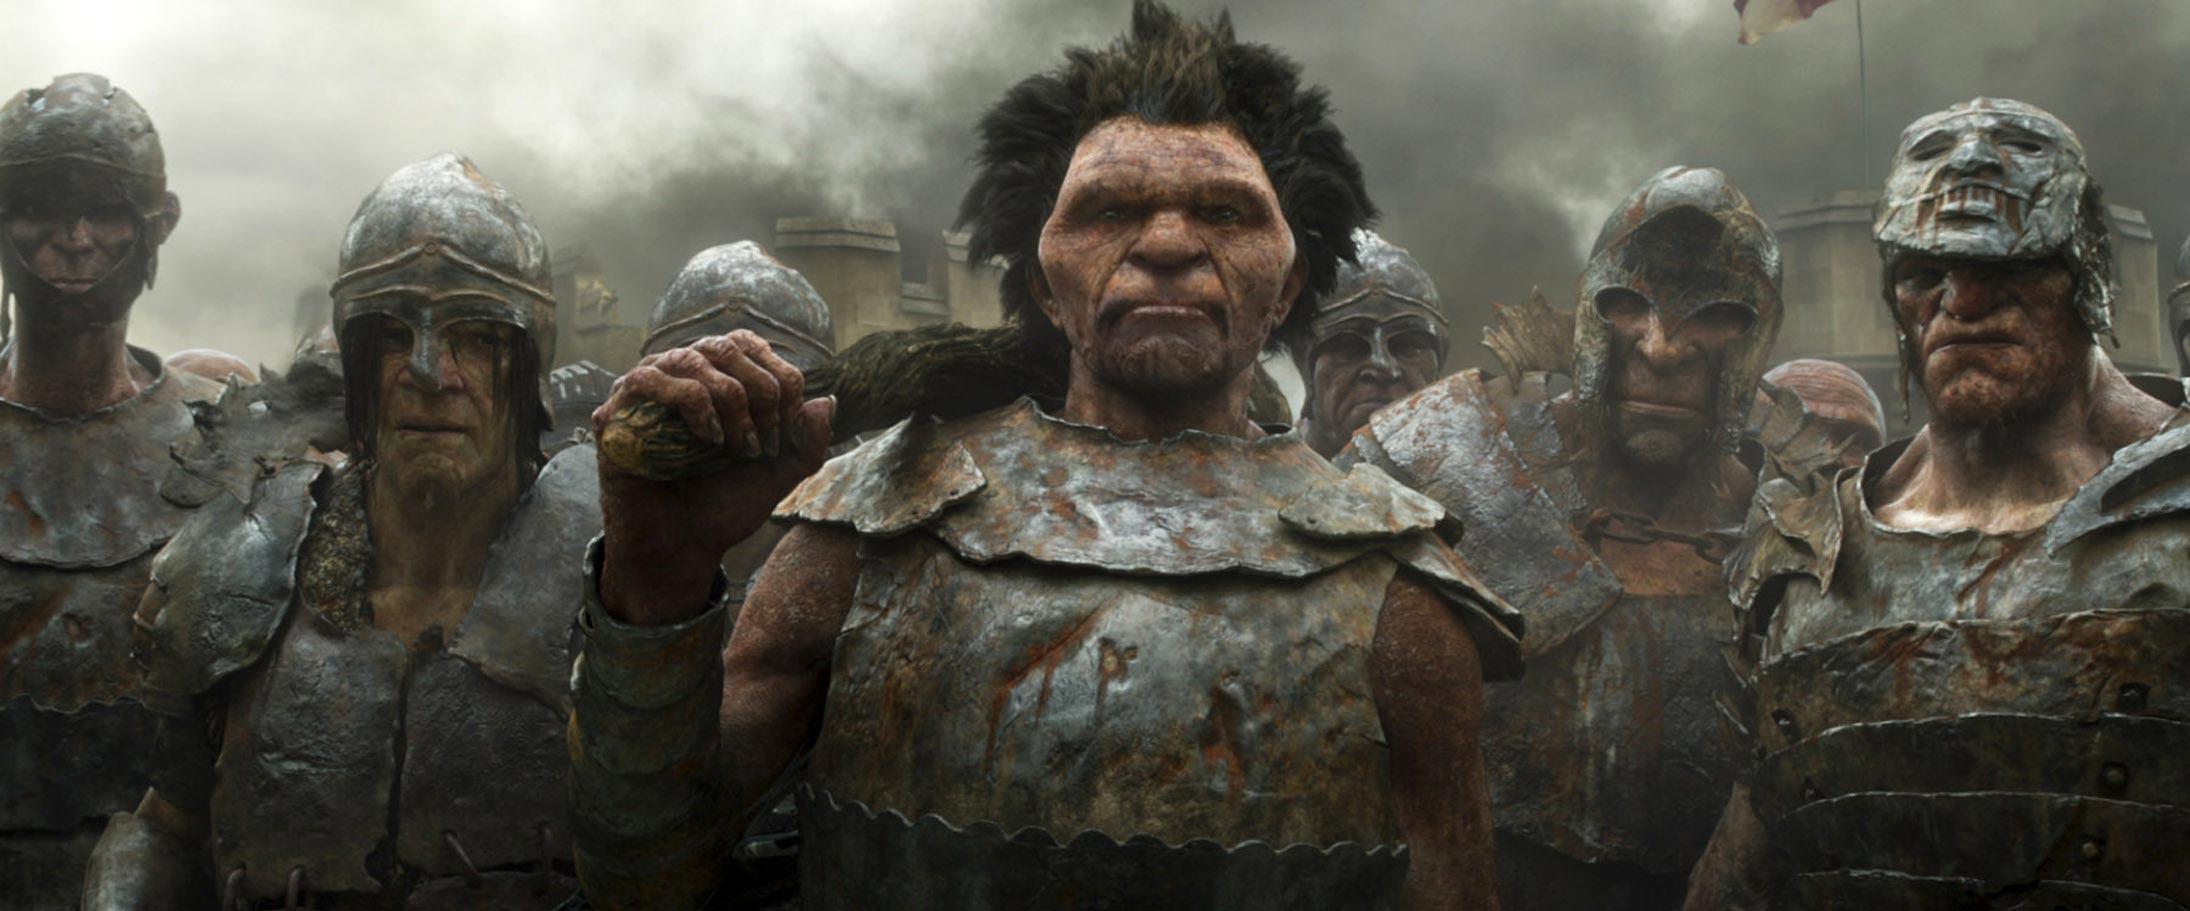 https://i1.wp.com/www.filmofilia.com/wp-content/uploads/2013/01/Jack-the-Giant-Slayer_22.jpg